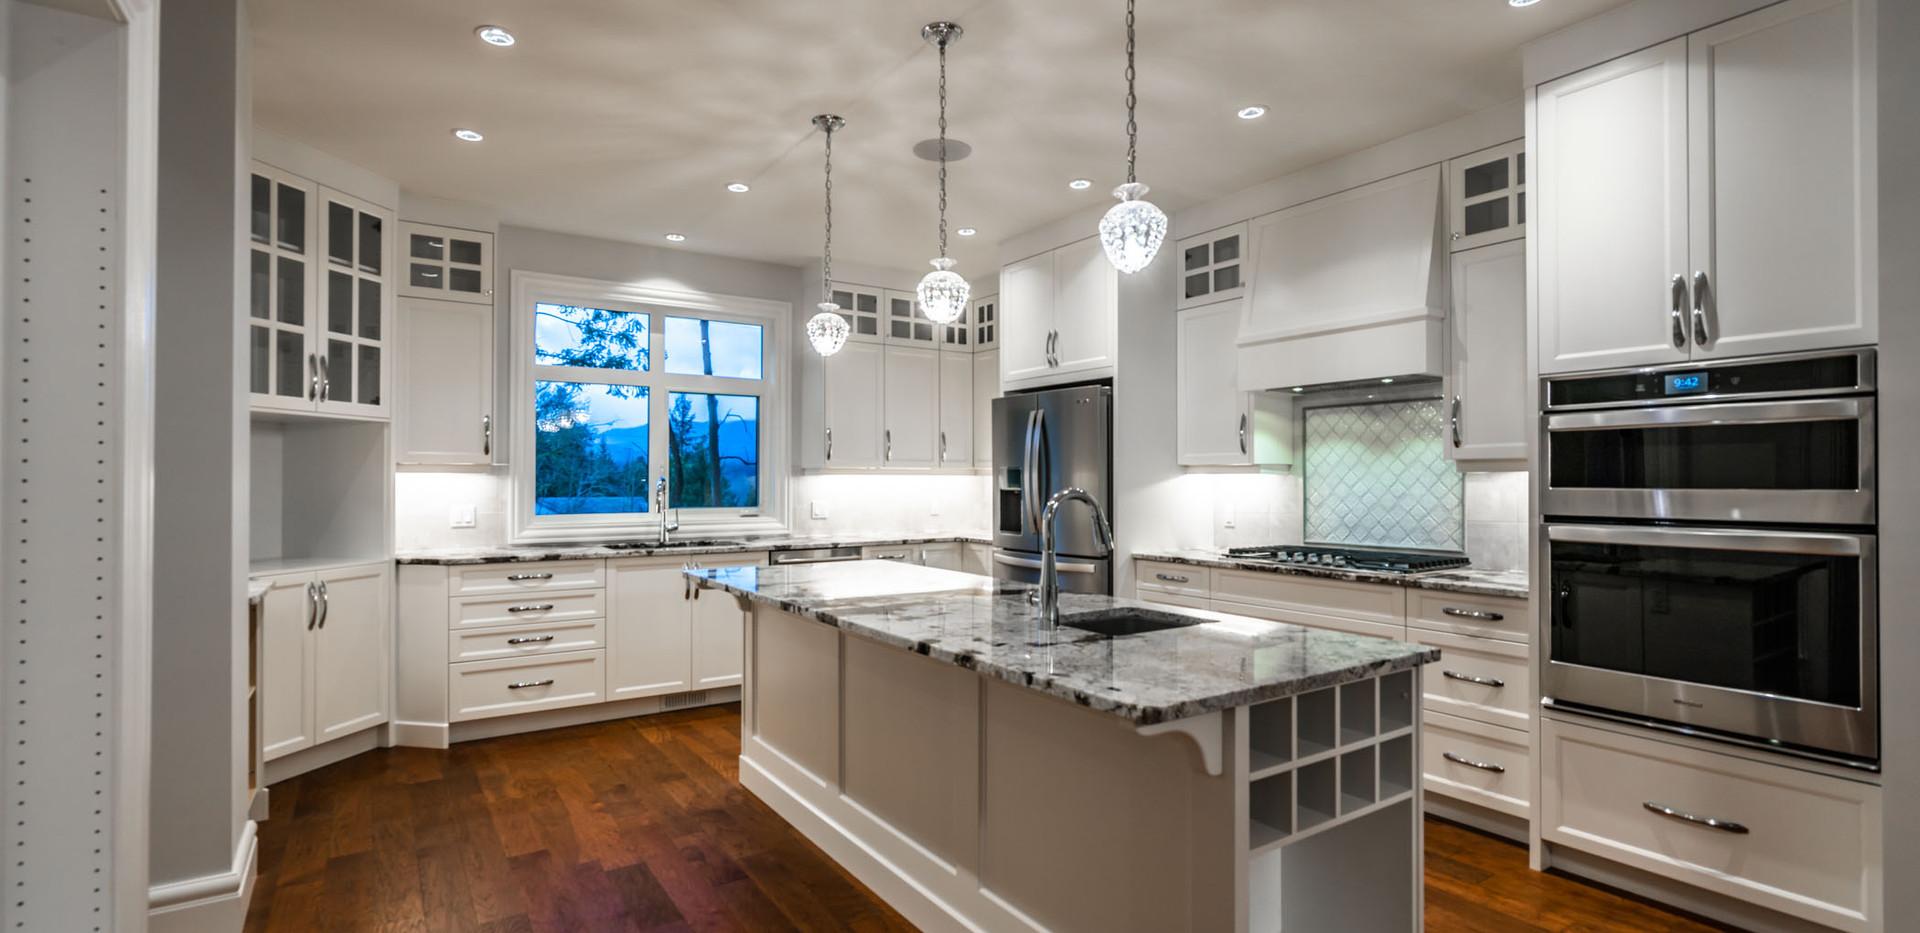 2847 Ashcraft Main House Kitchen